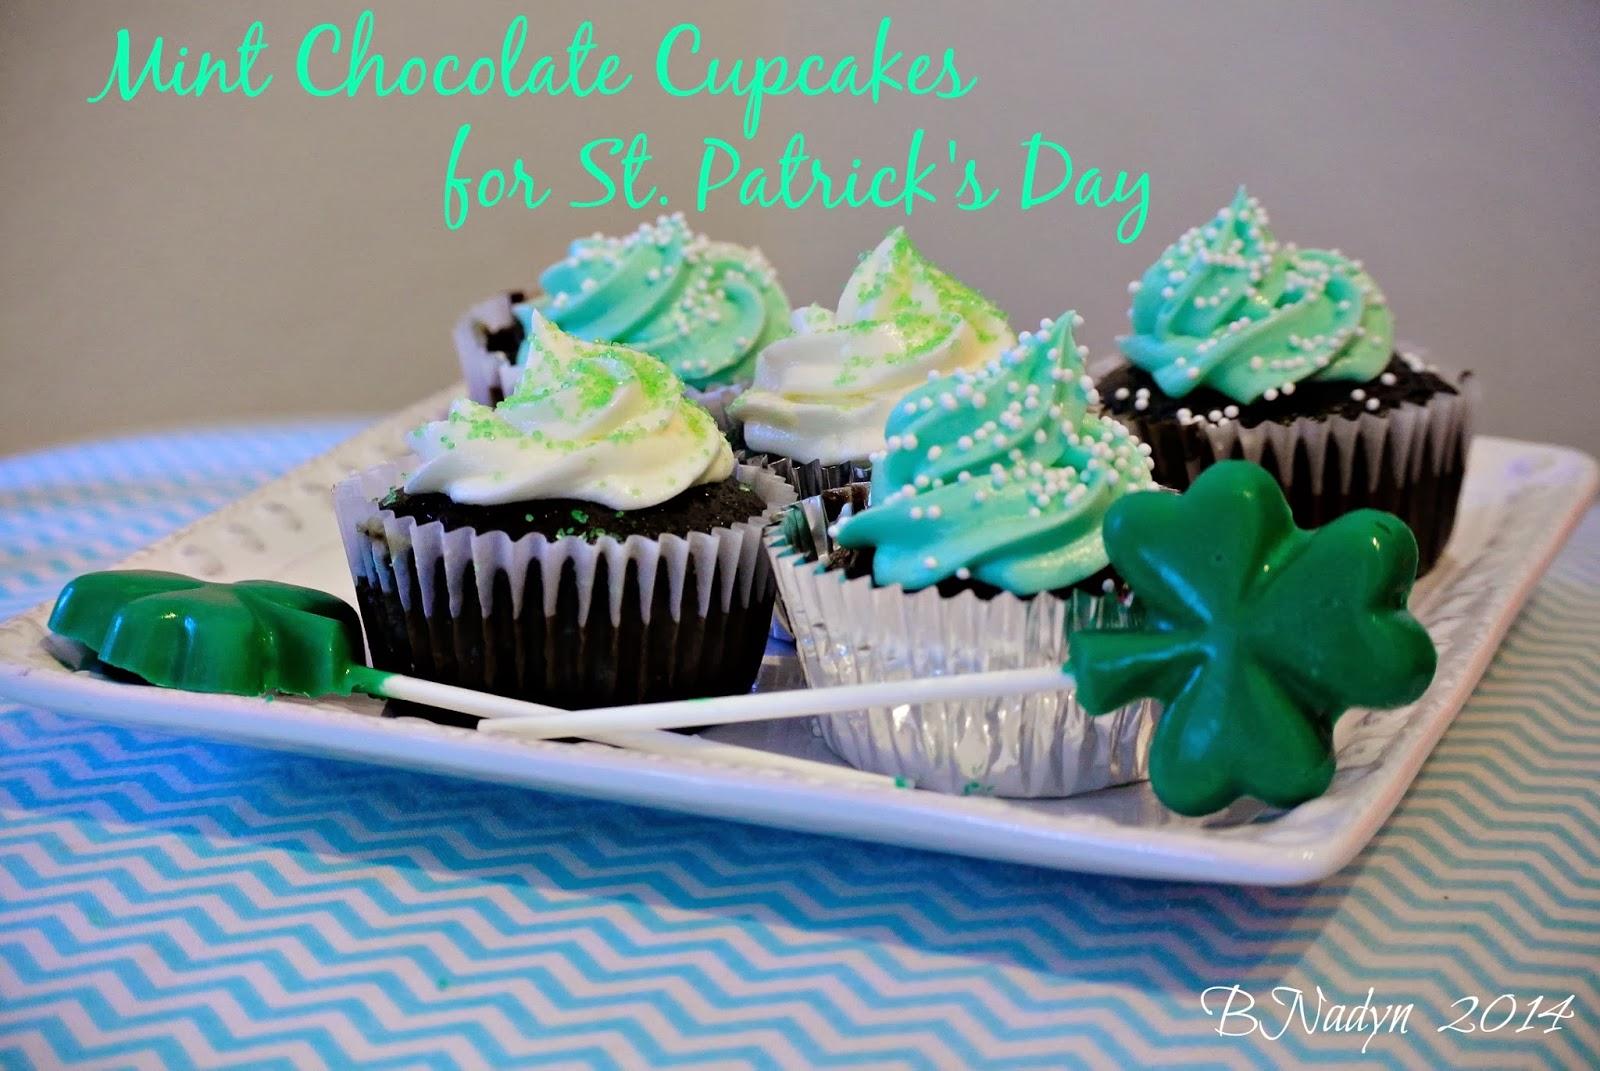 cupcakes, green desserts, food